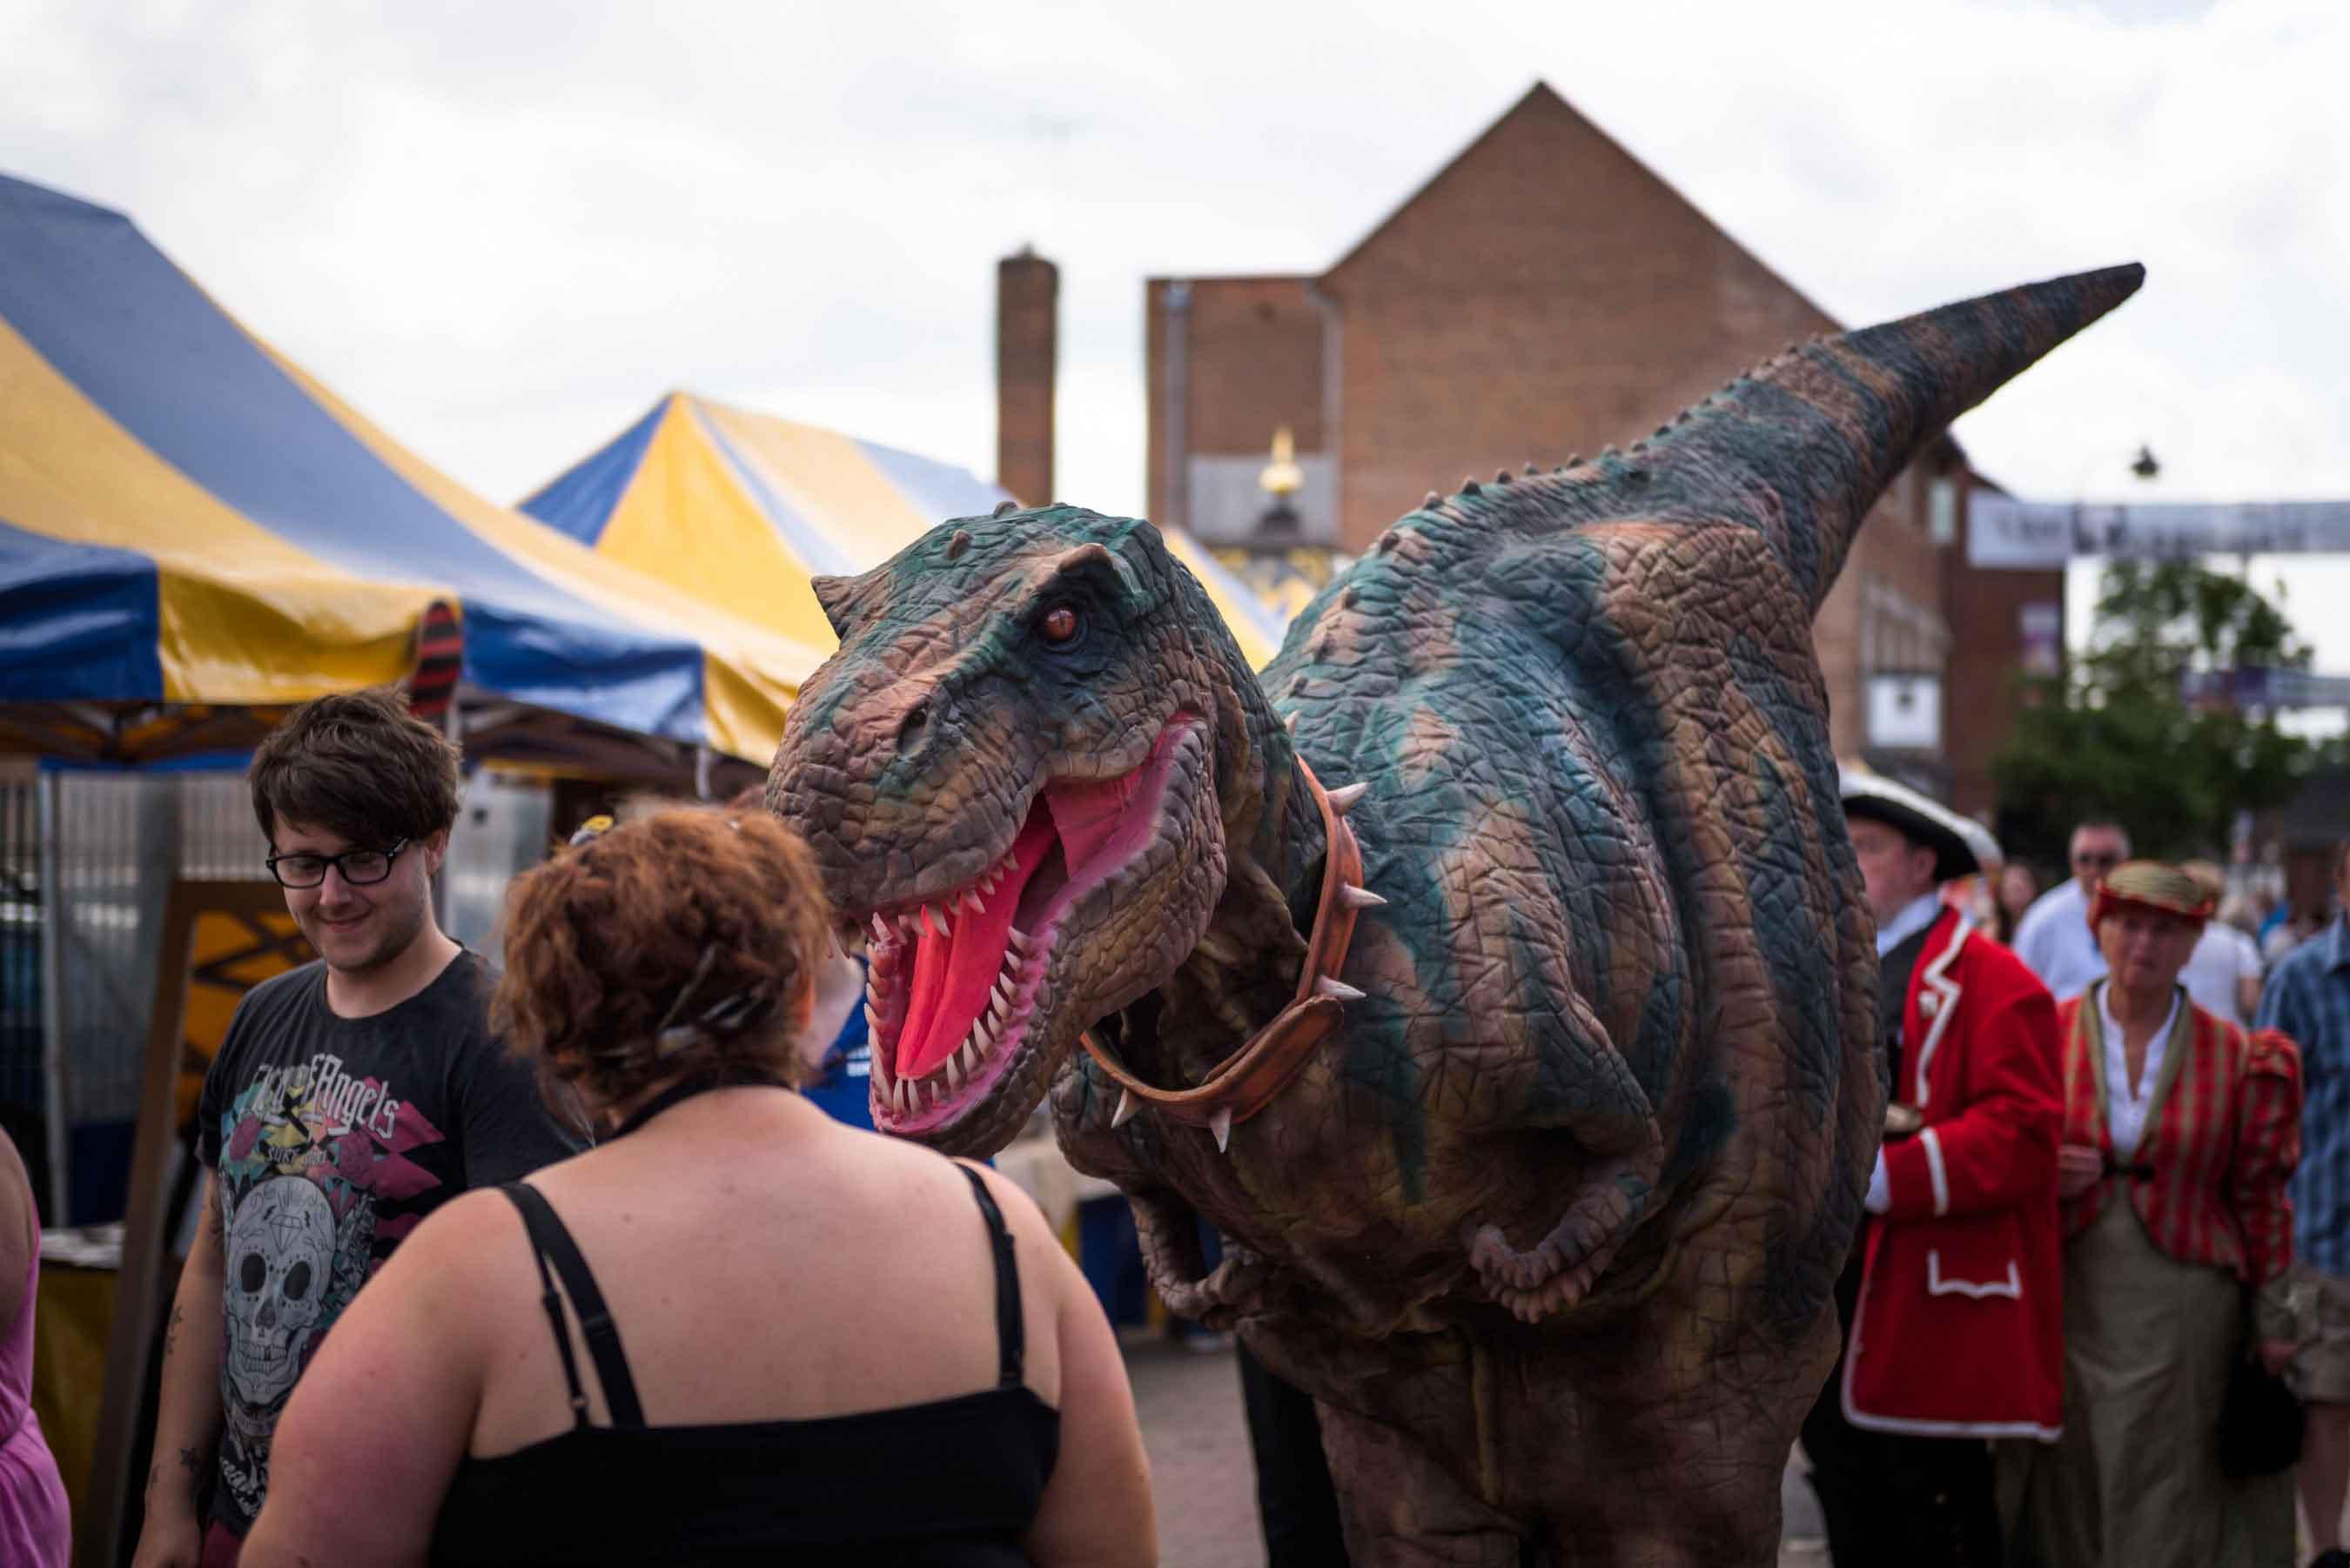 Best Robots For Kids >> Hire a Dinosaur - Hire A Dinosaur